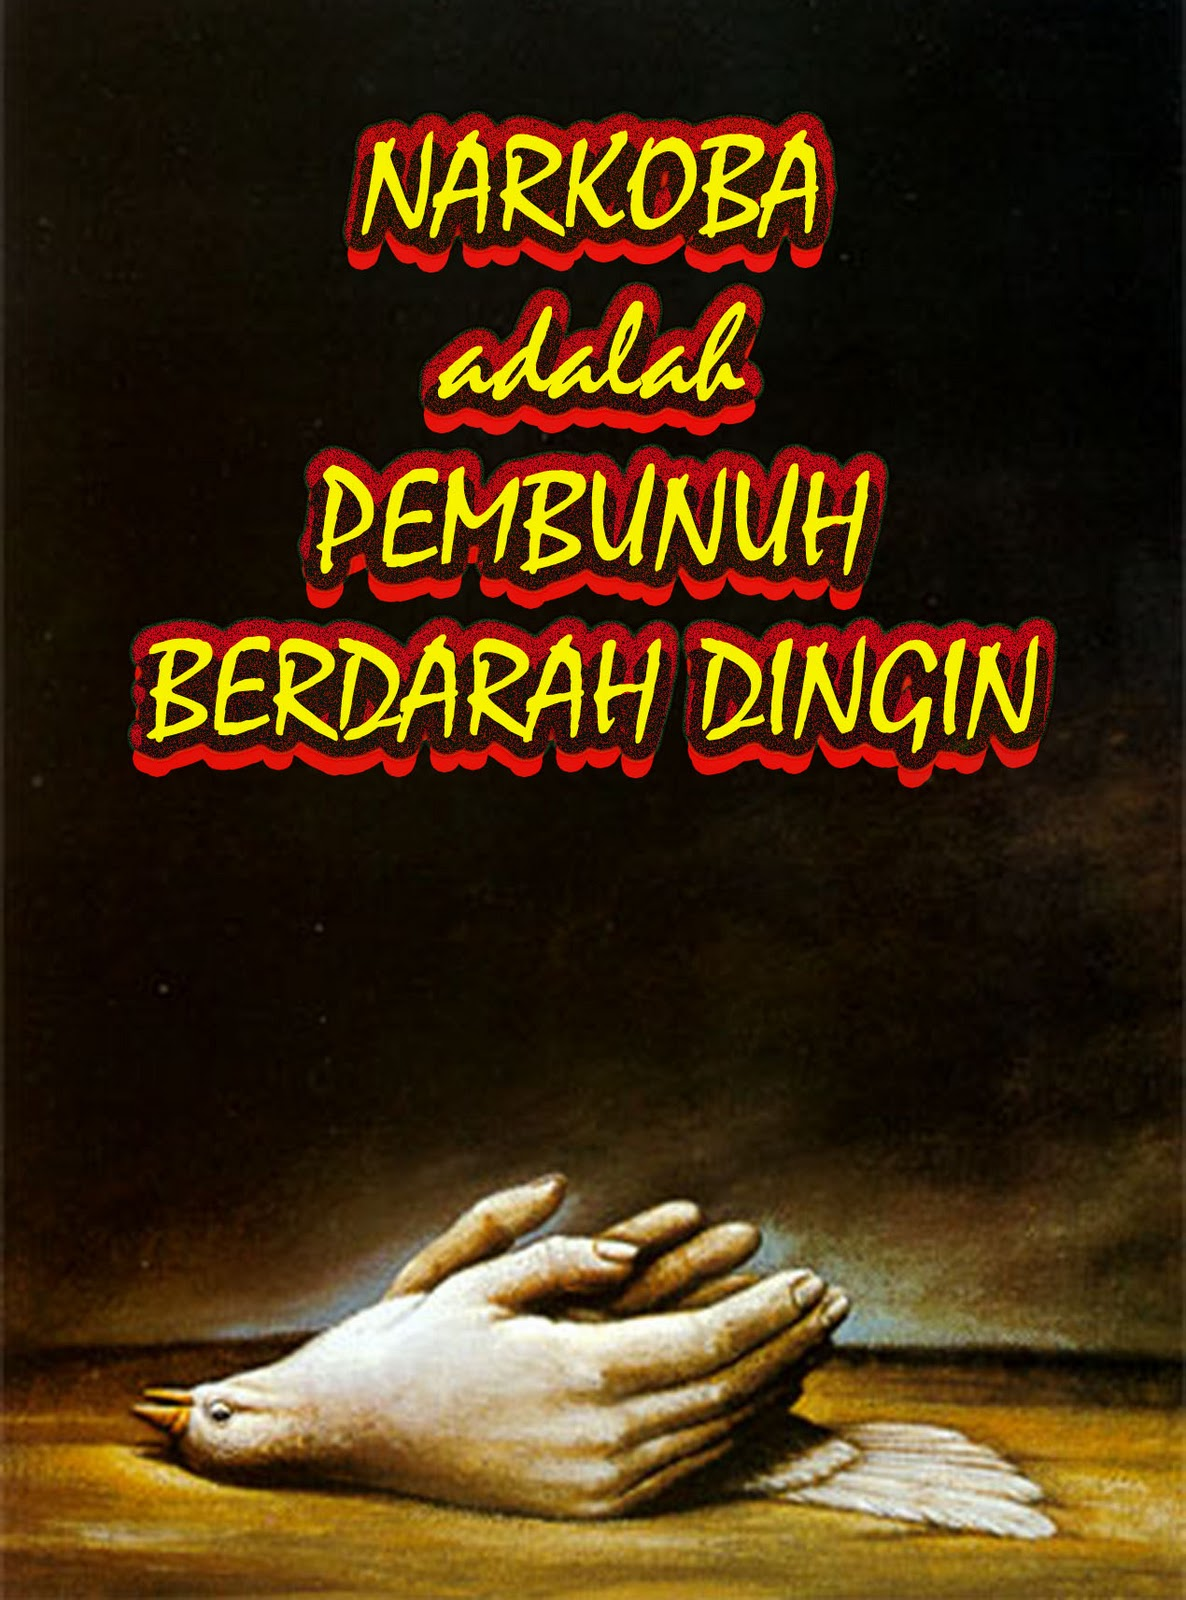 50 Soal Bahasa Indonesia Kelas 6 Semester 1 Kumpulan Newhairstylesformen2014 Com